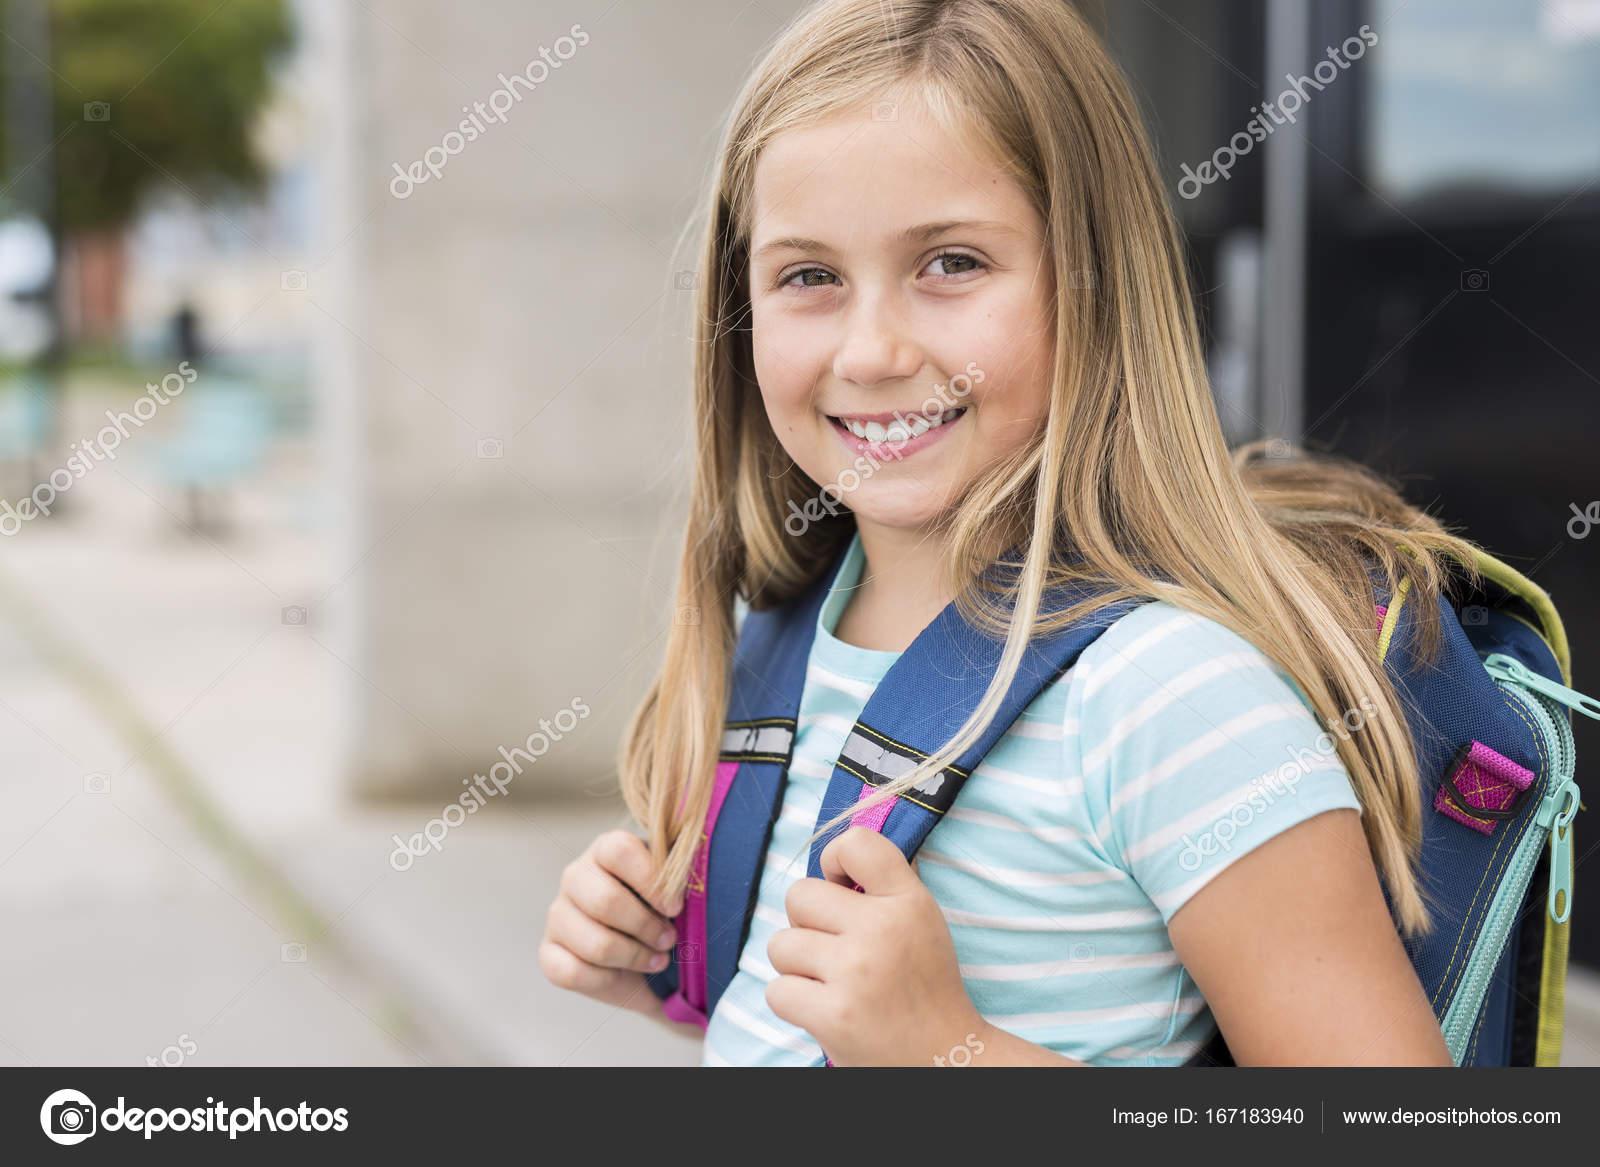 depositphotos_167183940-stock-photo-nine-years-old-girl-student.jpg